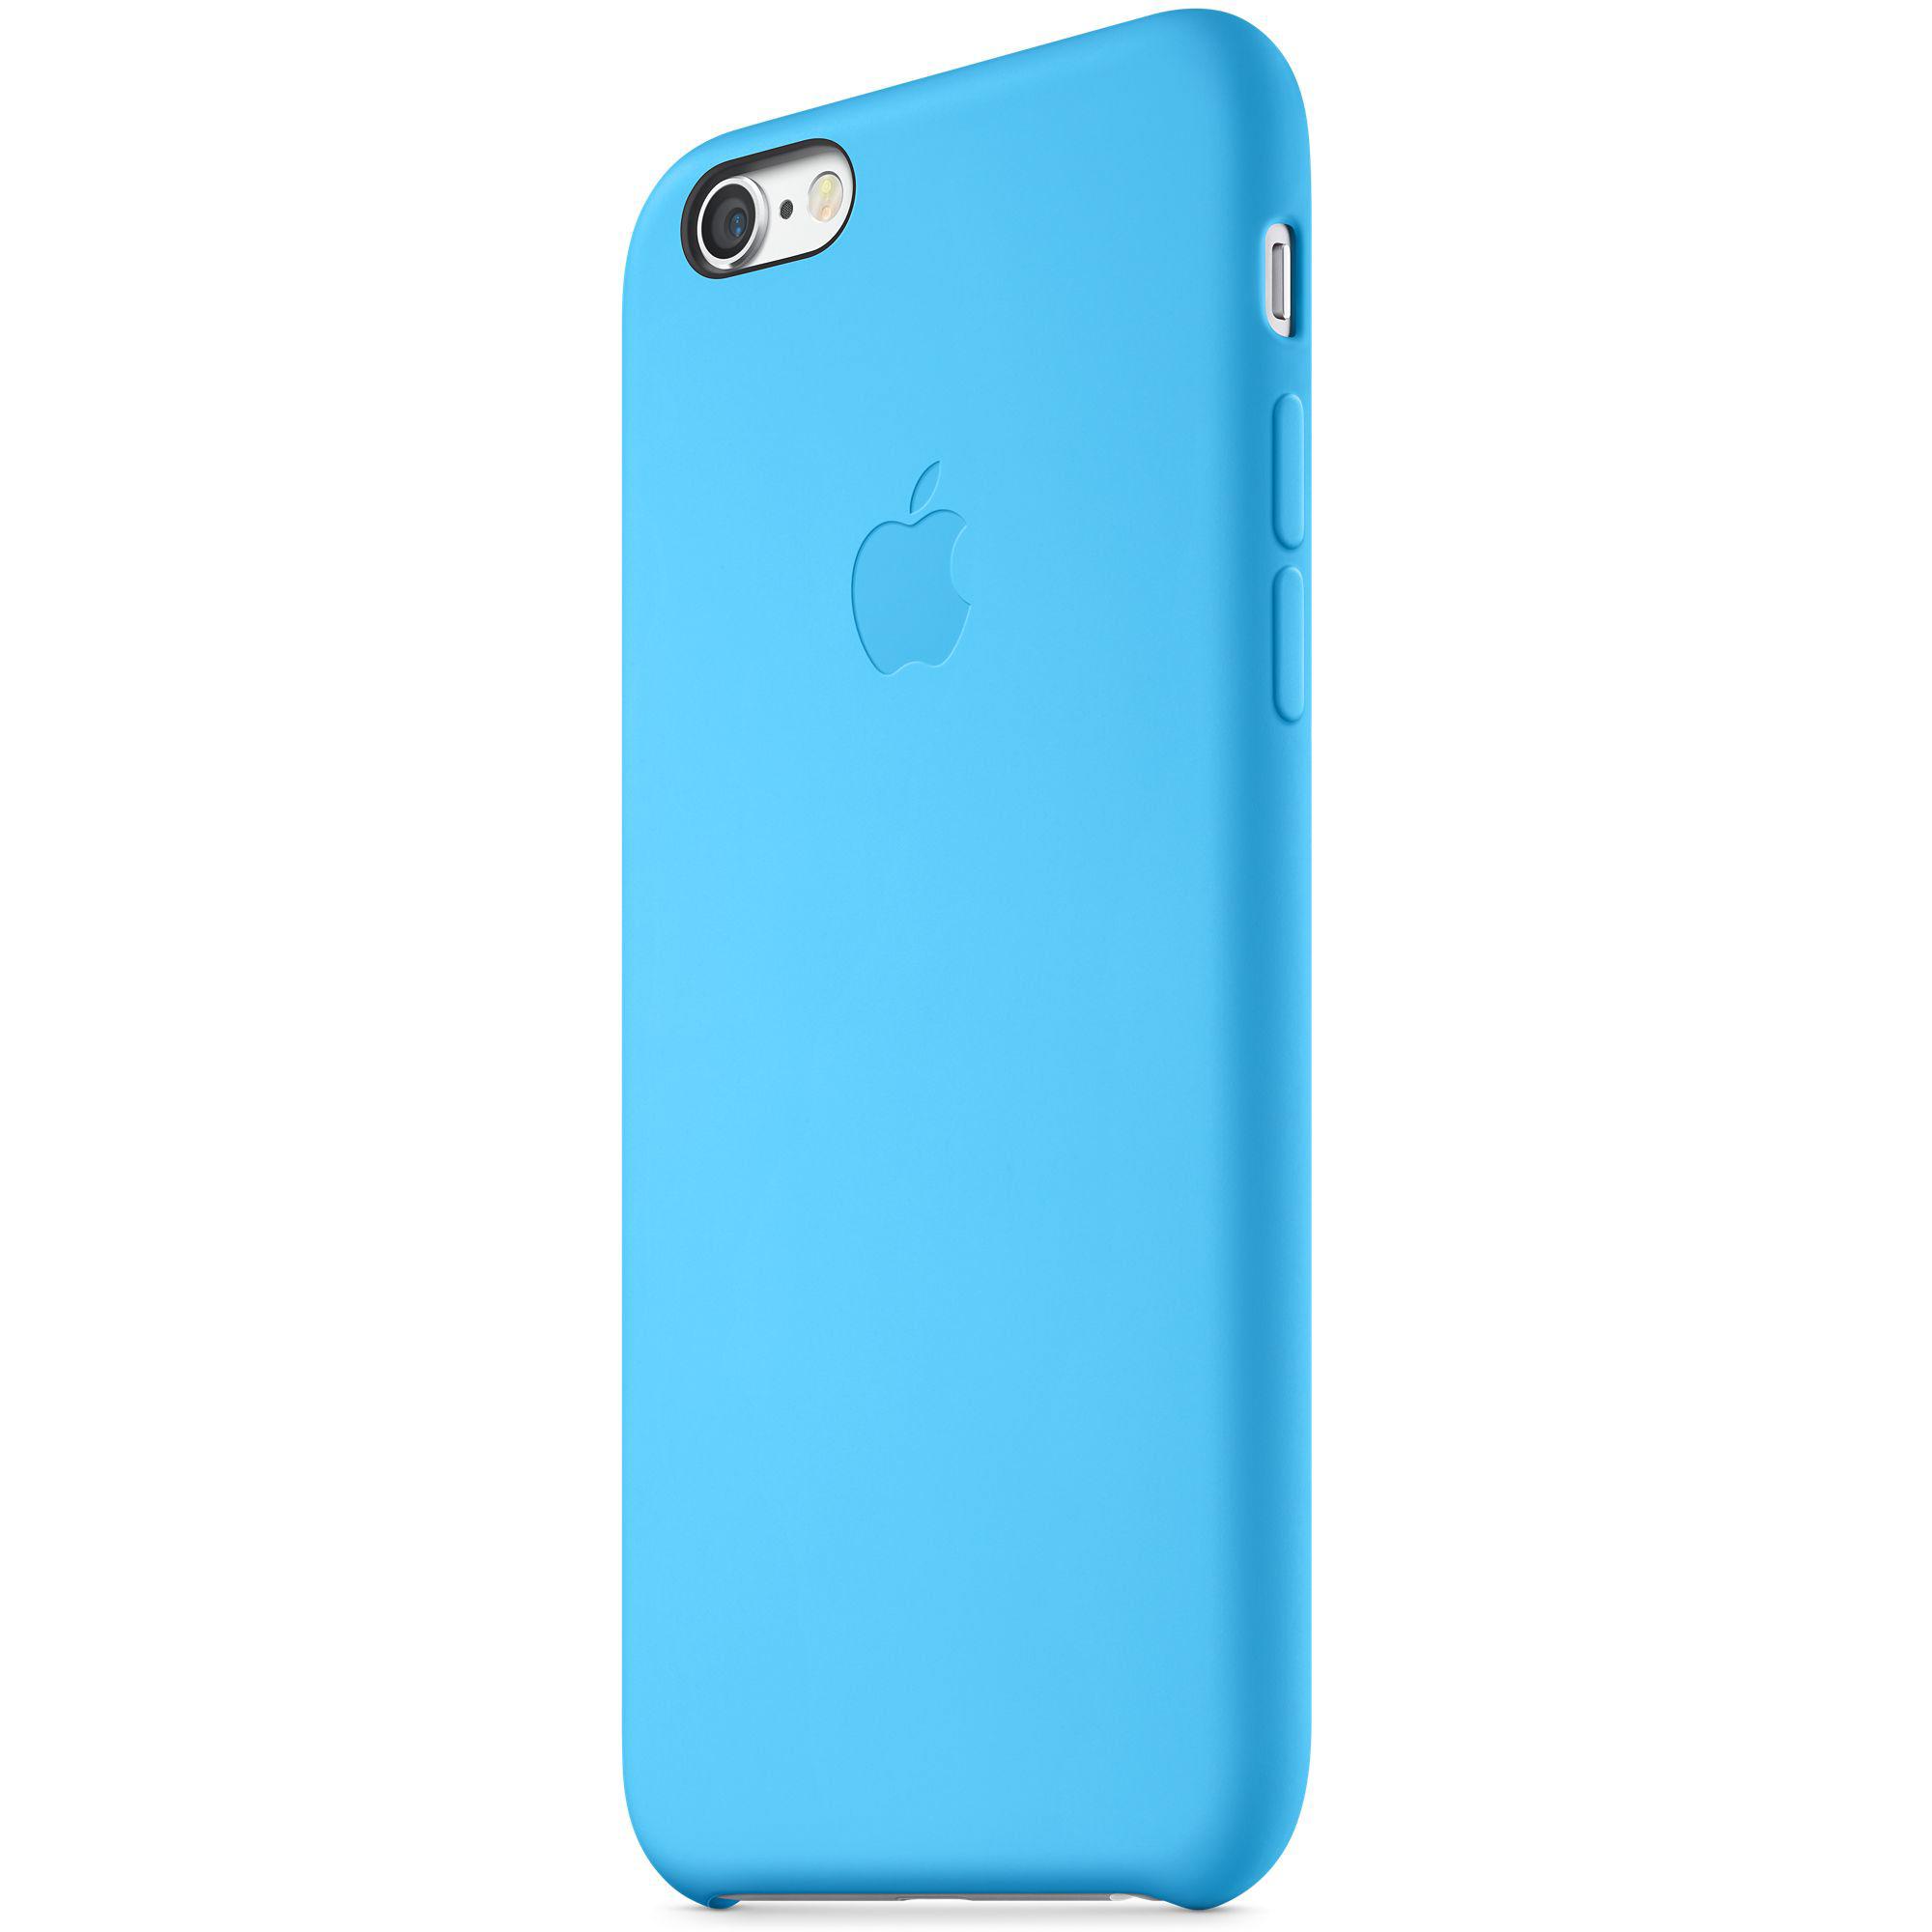 Case Design silicone phone cases : home cases bags apple iphone 6s silicone case apple iphone 6s silicone ...